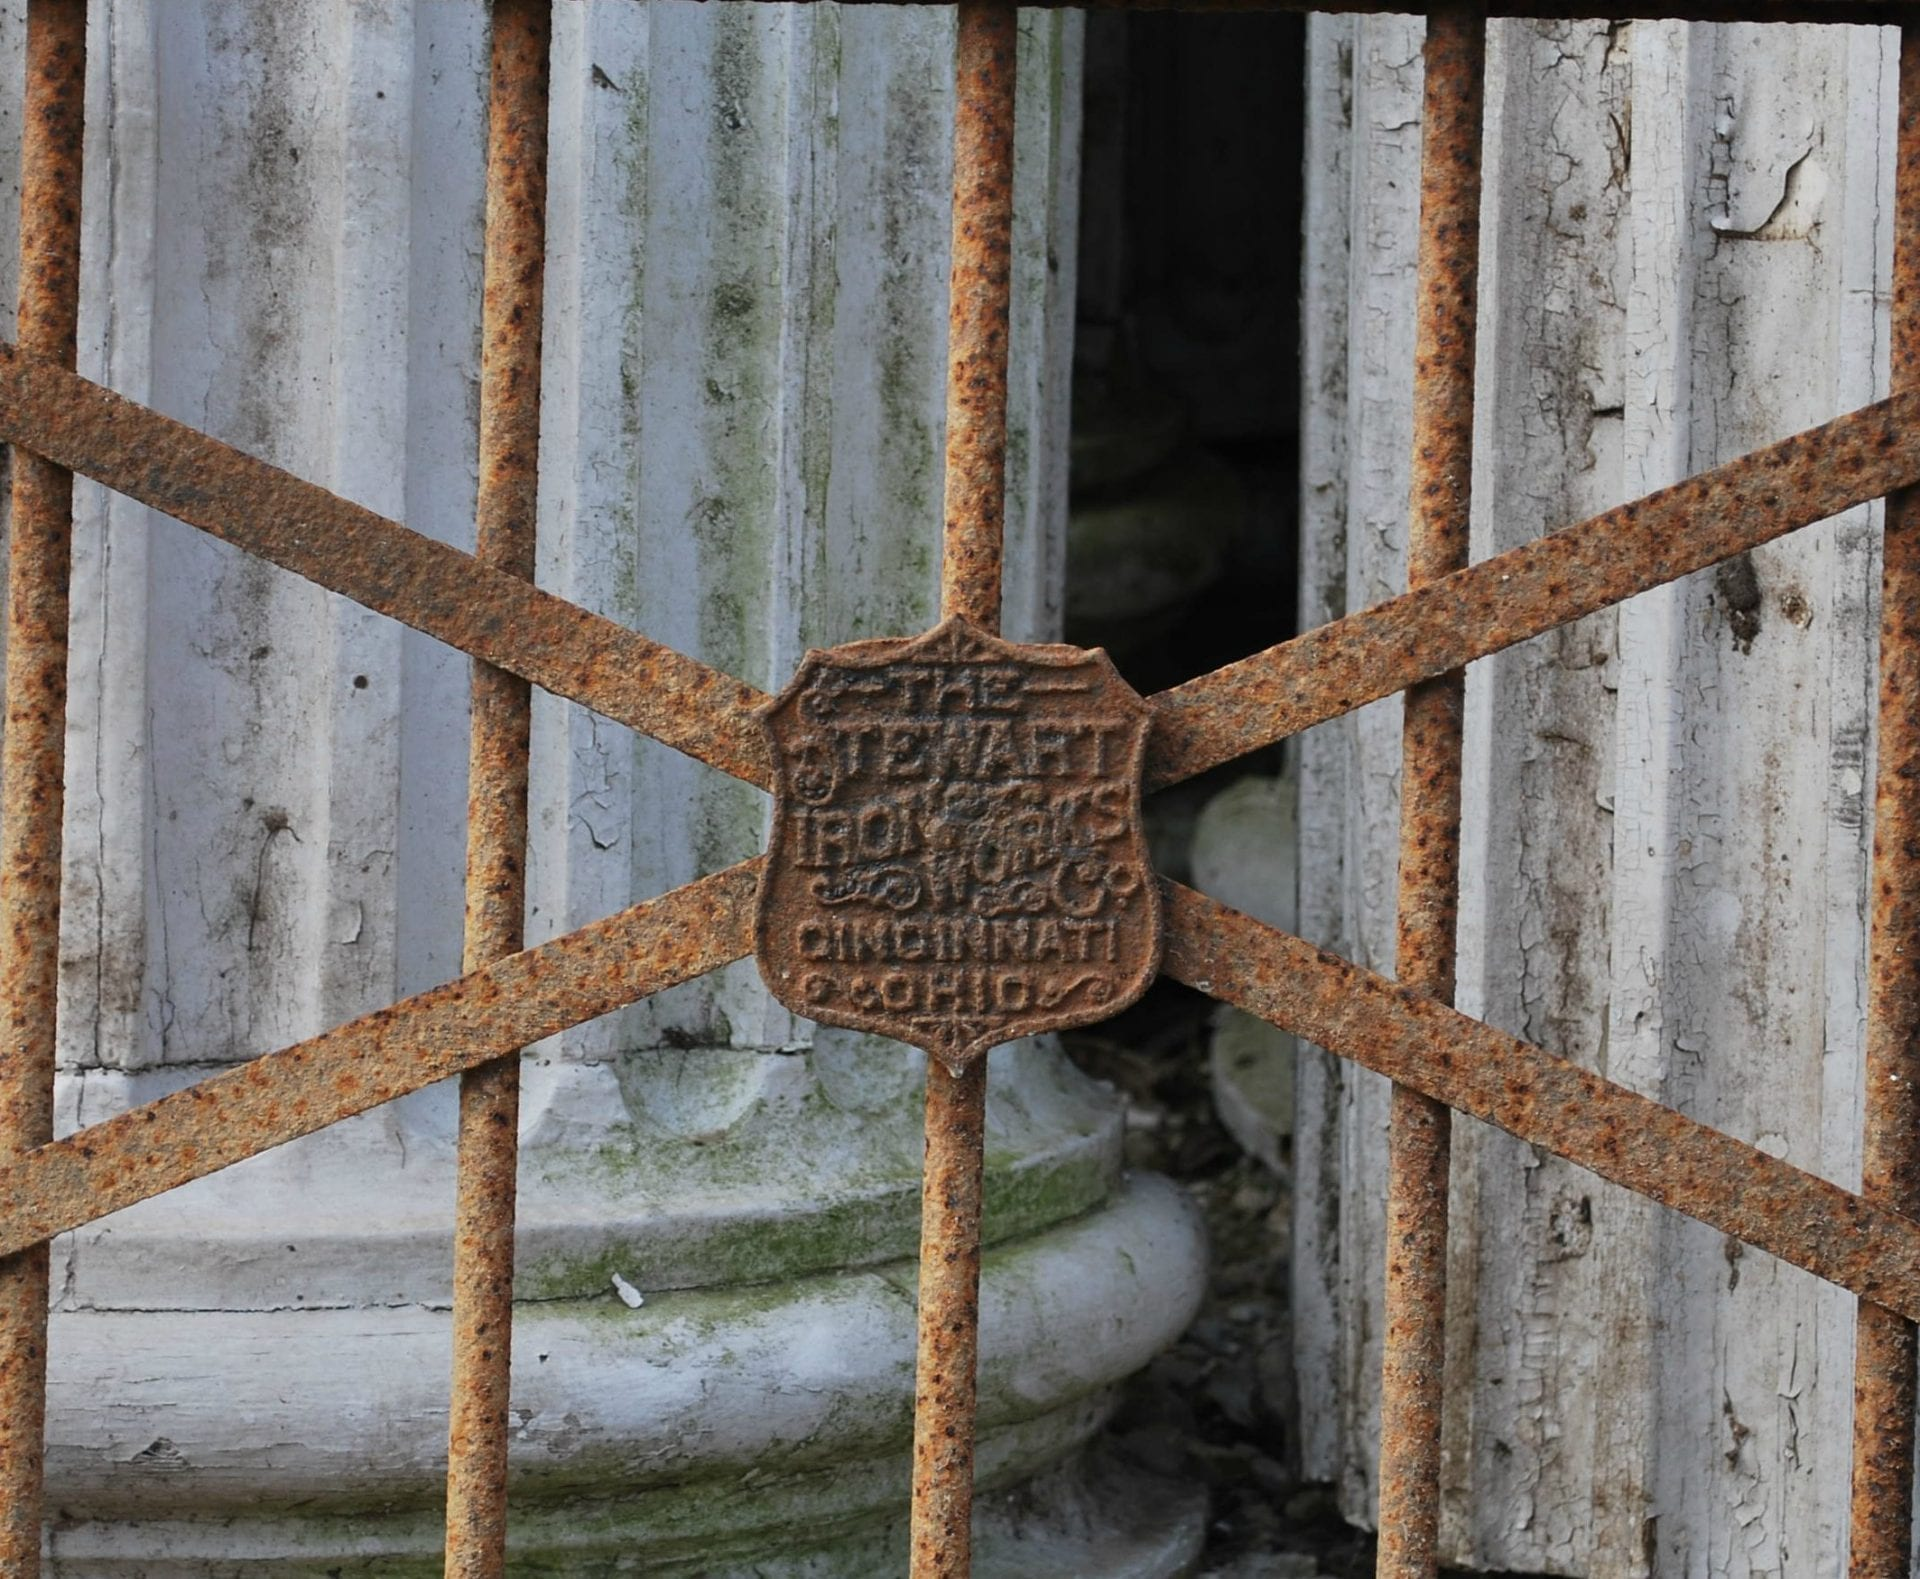 Antique Stewart Iron Works Wrought Iron Gate